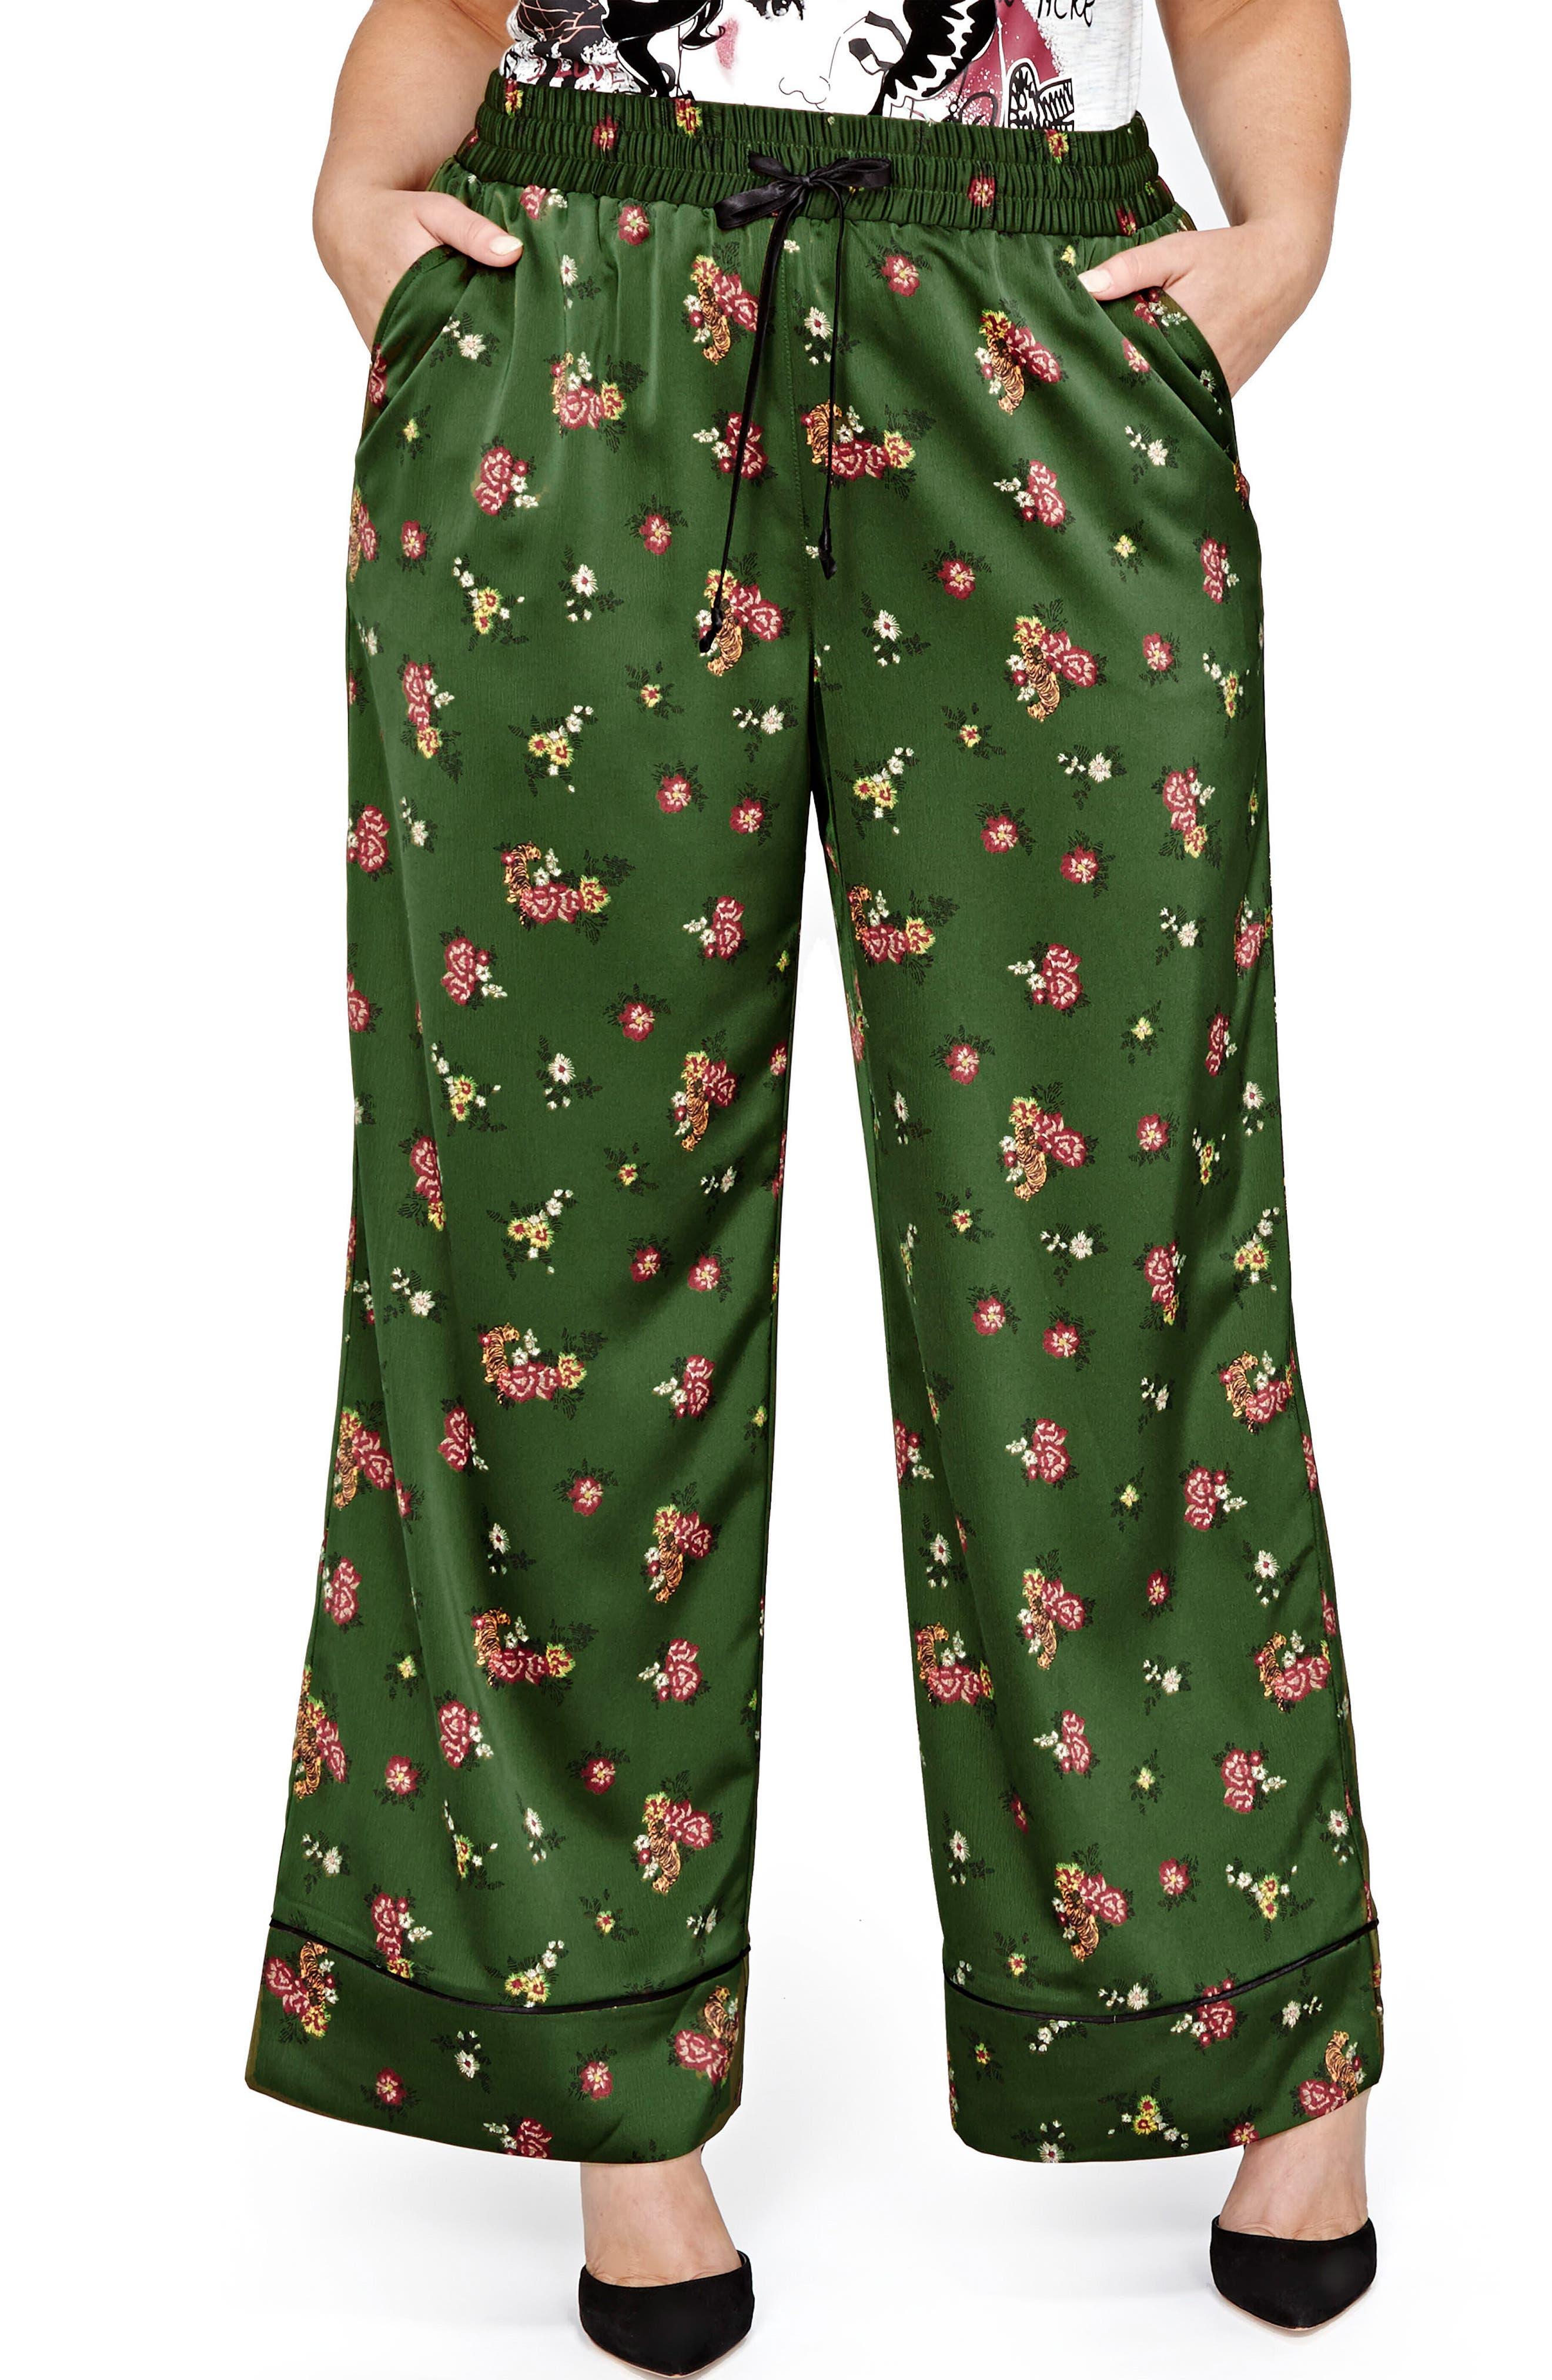 Main Image - ADDITION ELLE LOVE AND LEGEND Jordyn Woods Wide-Leg Satin Pants (Plus Size)